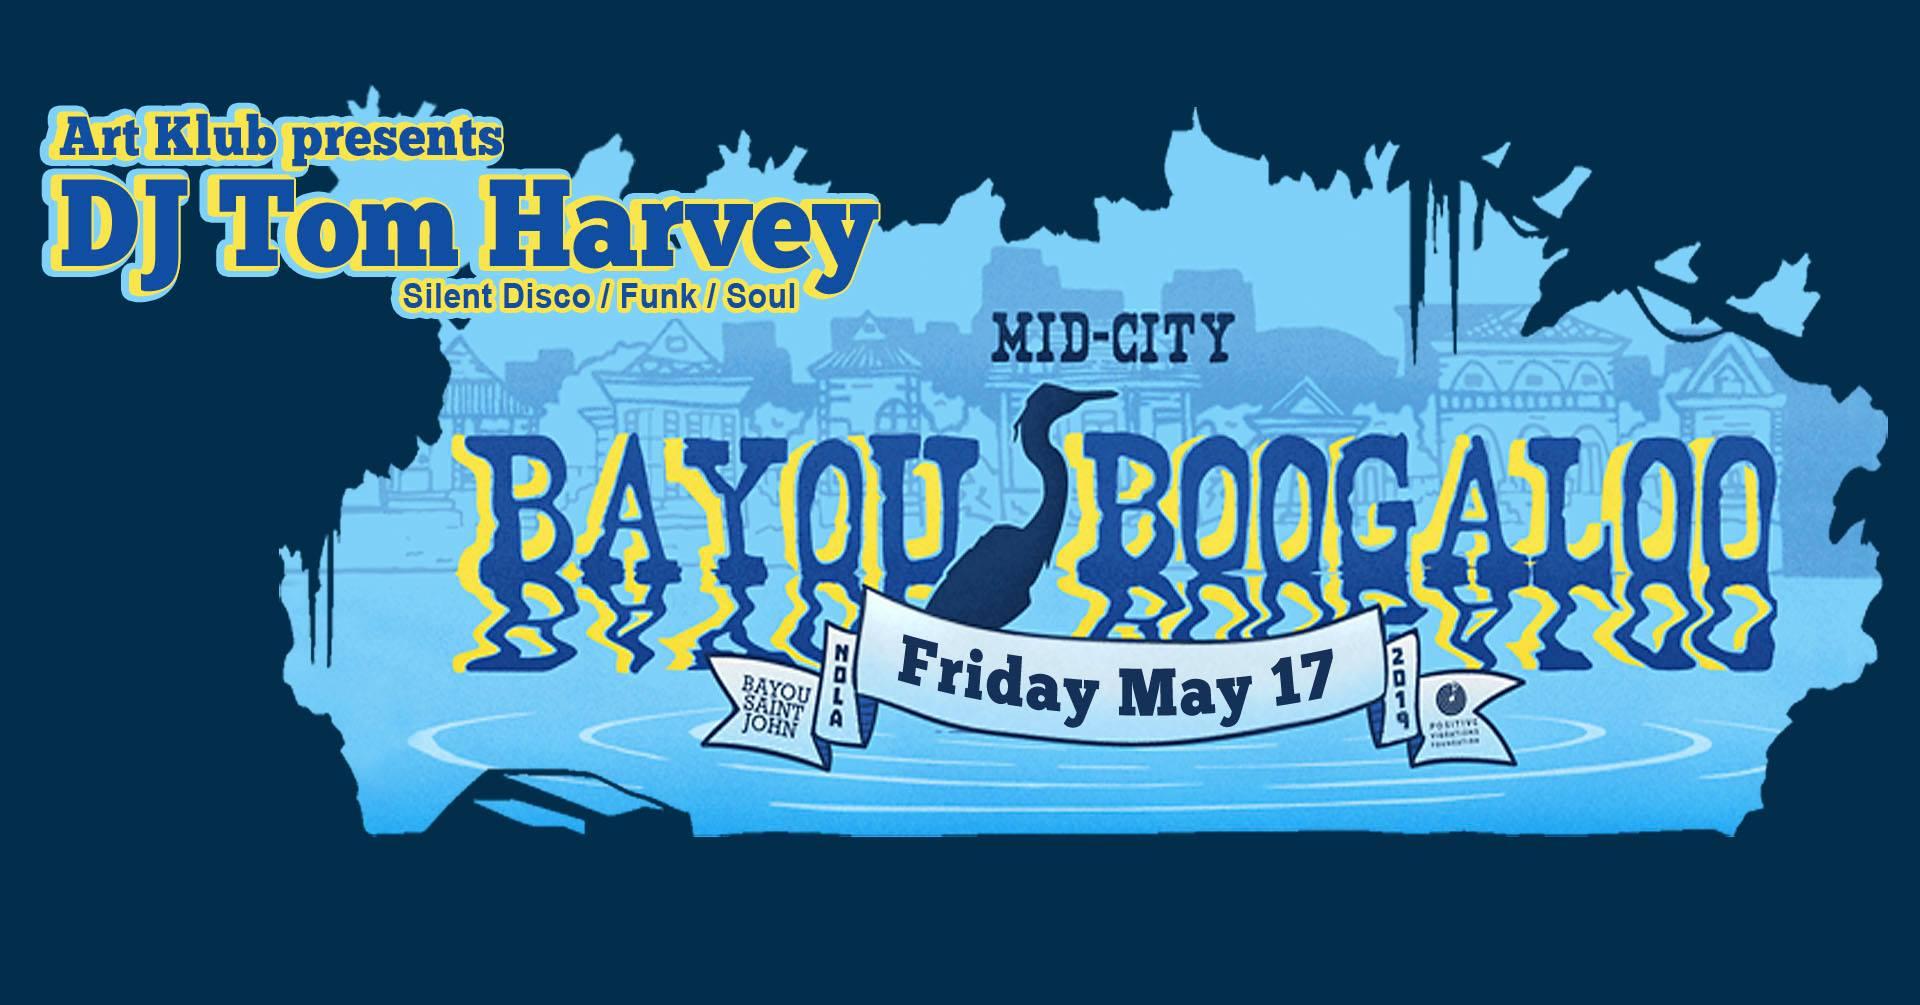 DJ Tom Harvey Bayou Boogaloo.jpg